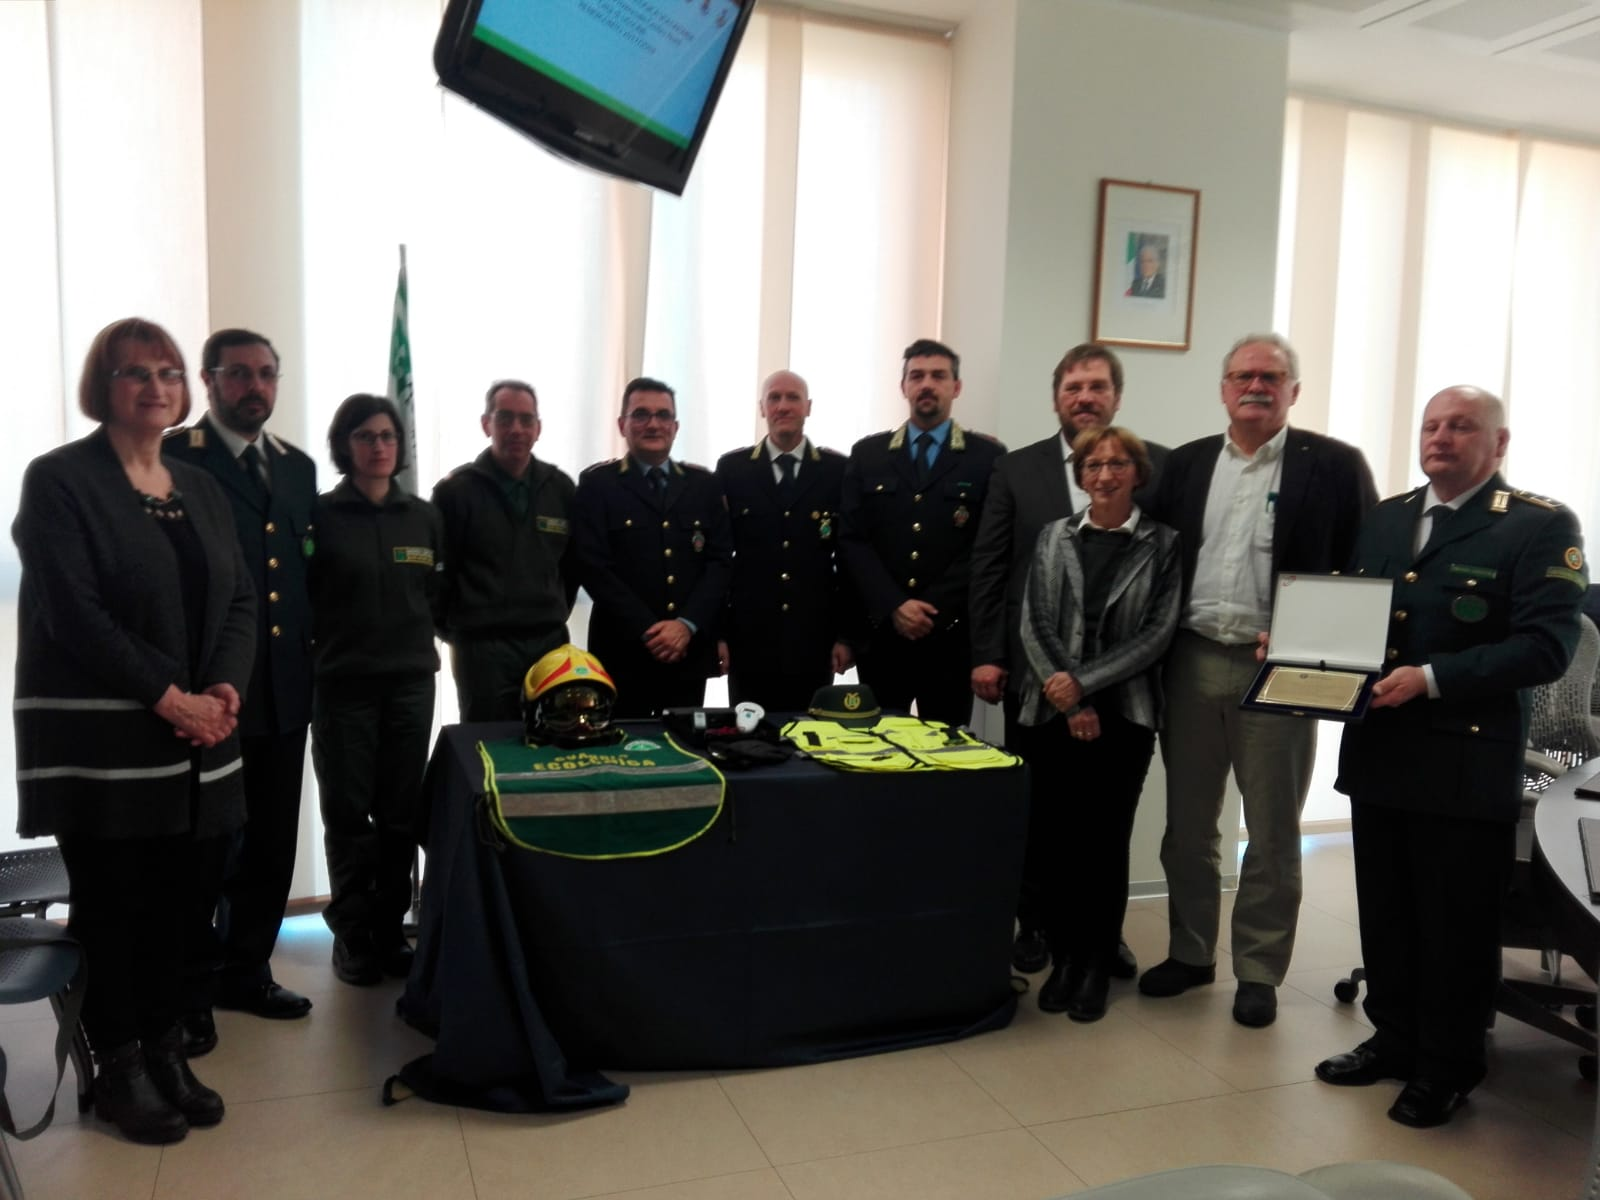 Guardie ecologiche volontarie di Lissone premiate in Provincia